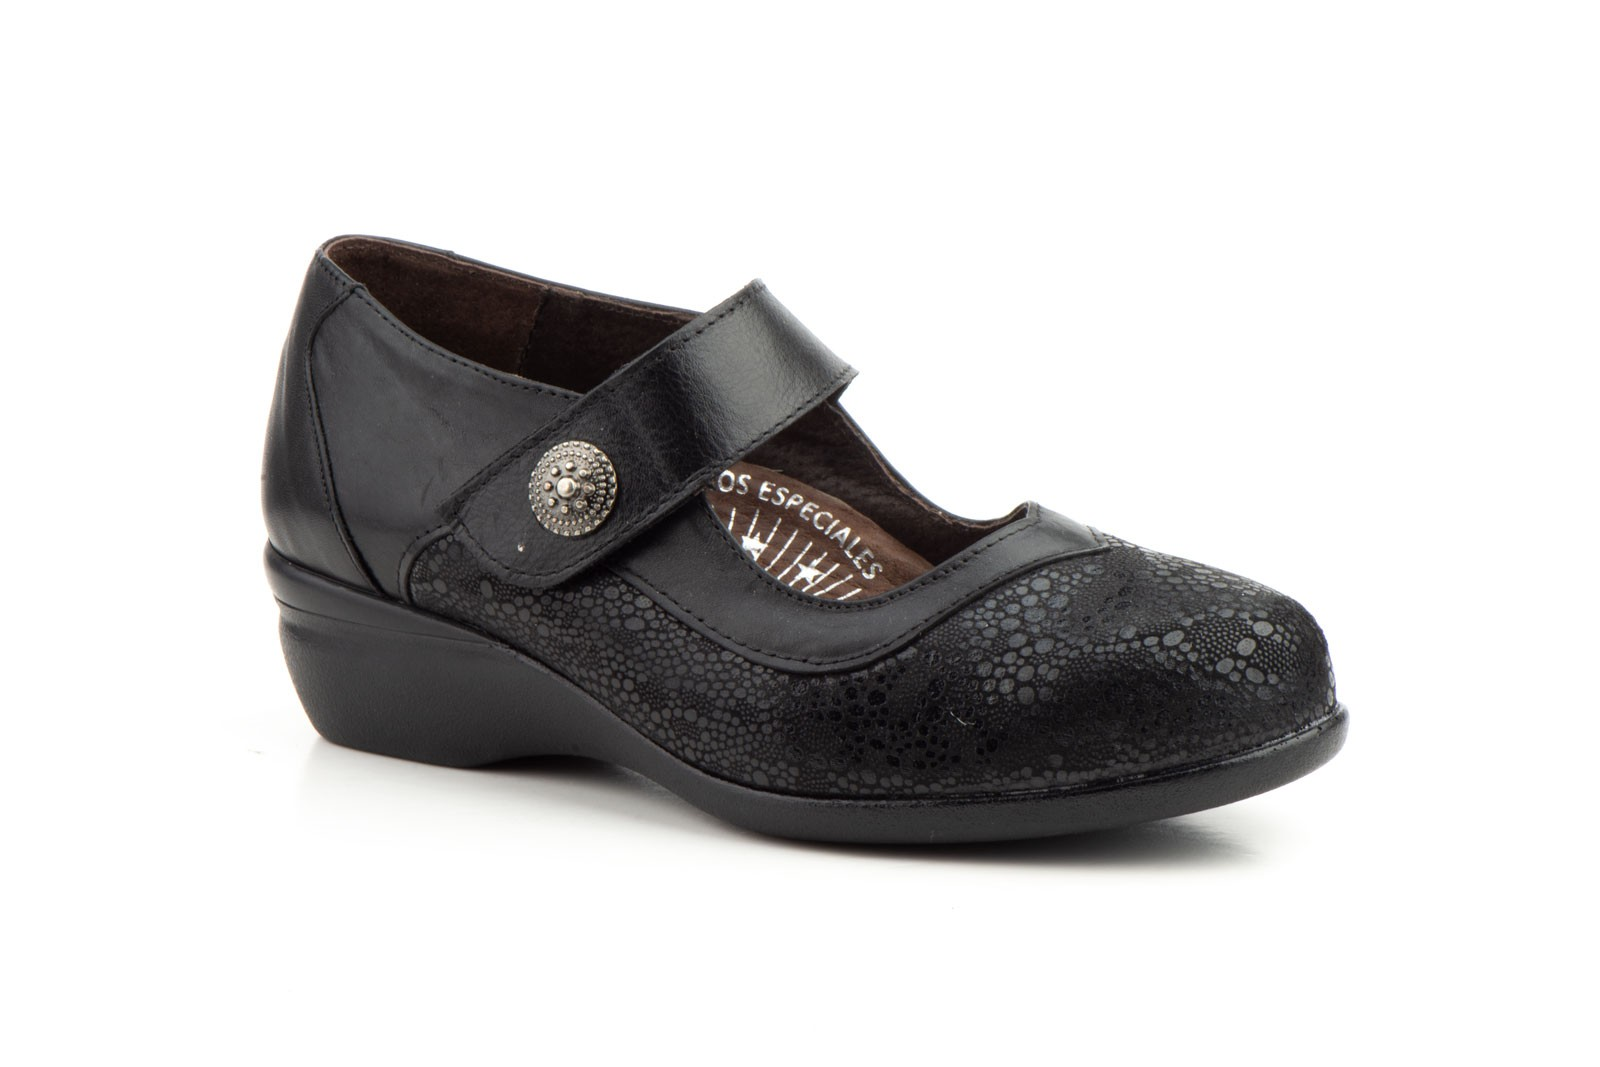 Zapatos Mujer Ancho Especial Licra Piel Negro Velcro